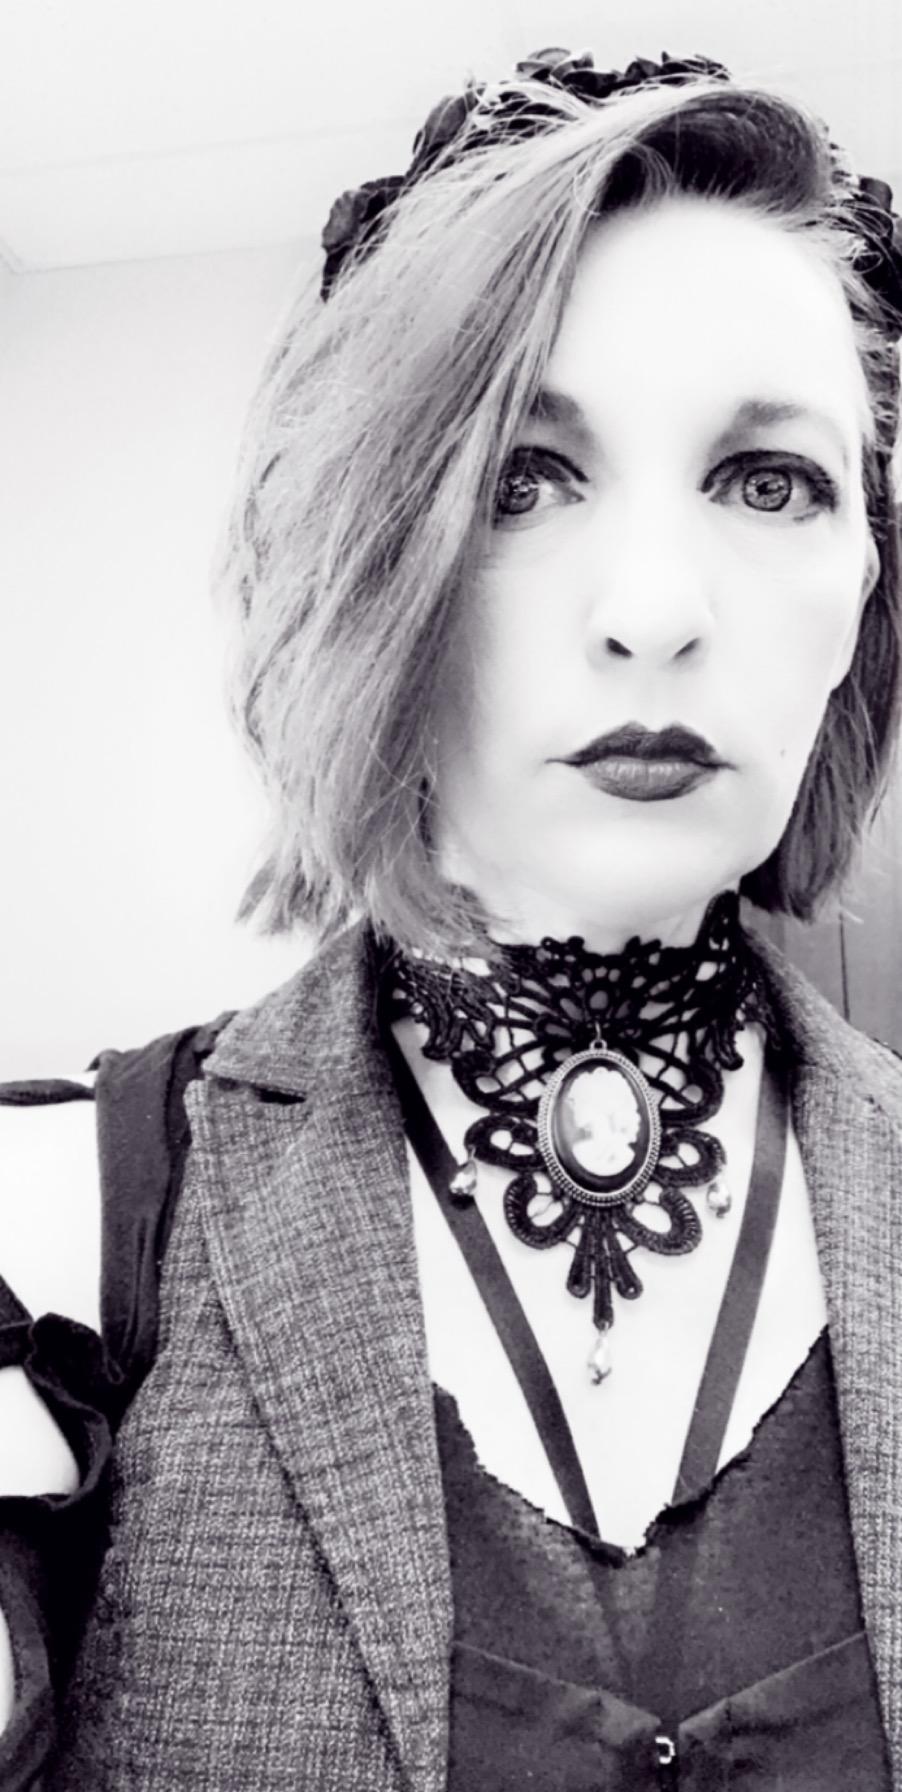 World Goth Day